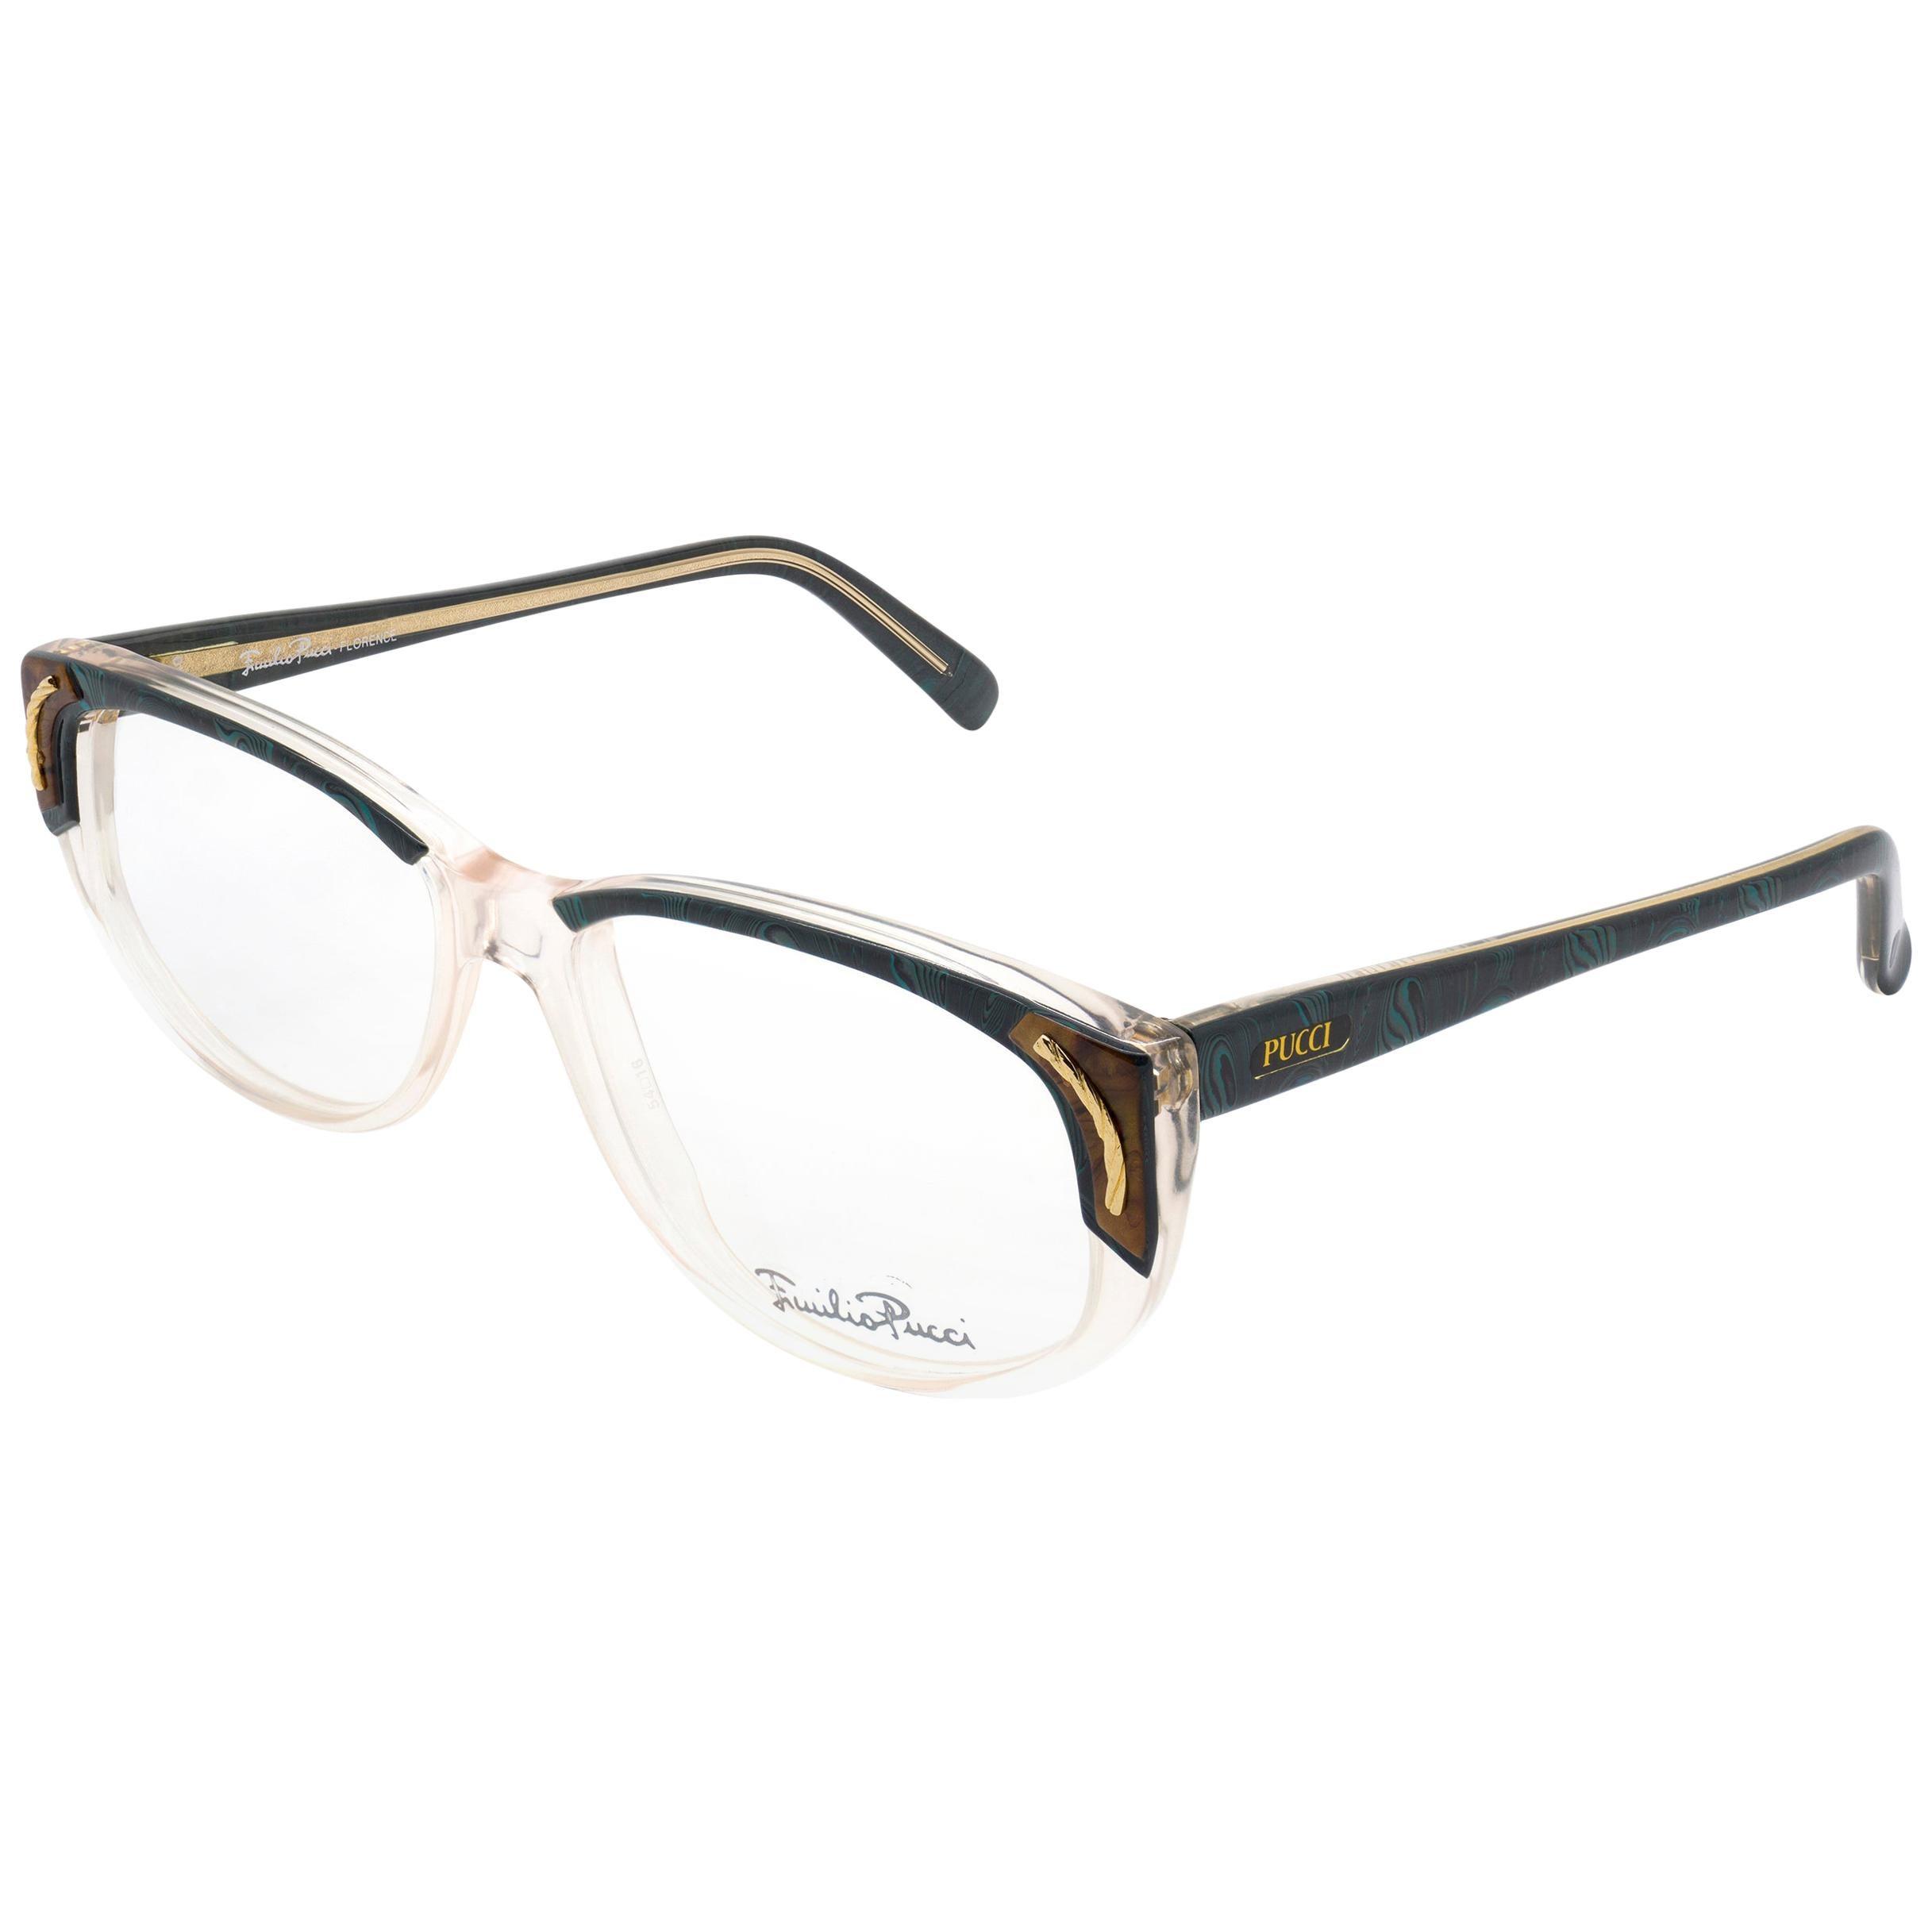 Emilio Pucci 80s eyeglasses for women